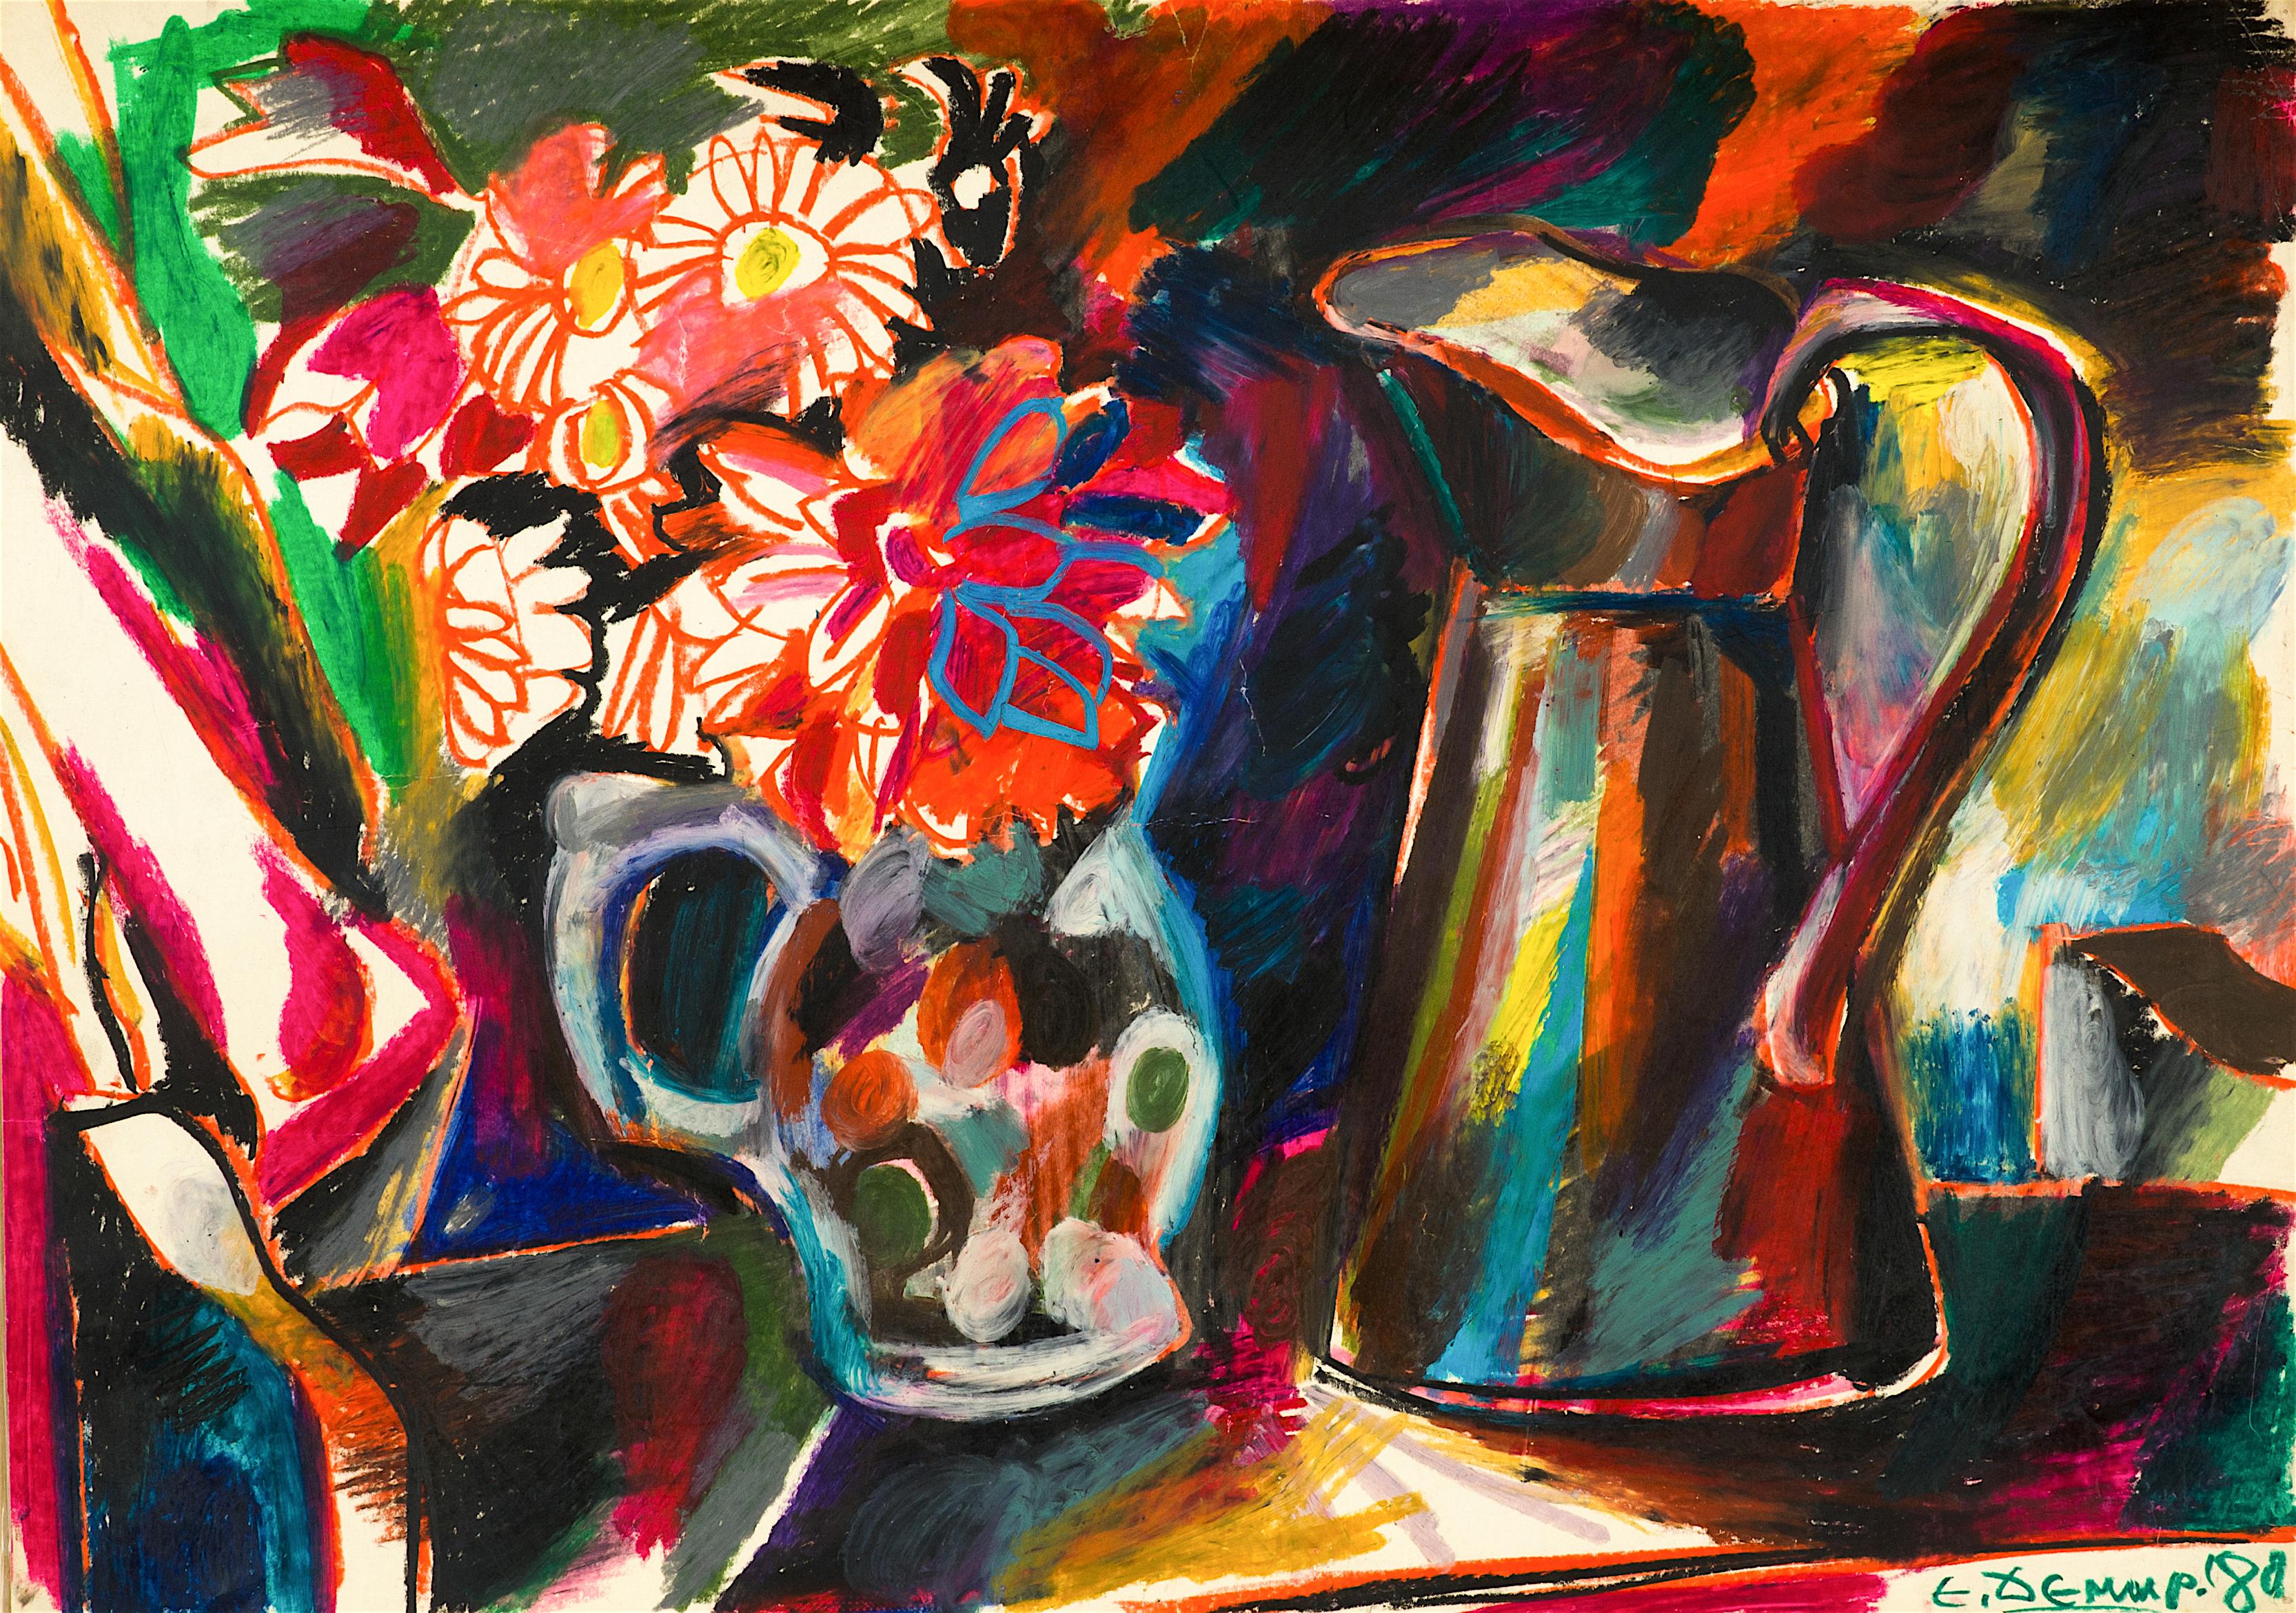 Едмонд Демирджиян - Натюрморт с кана и цветя, 1980